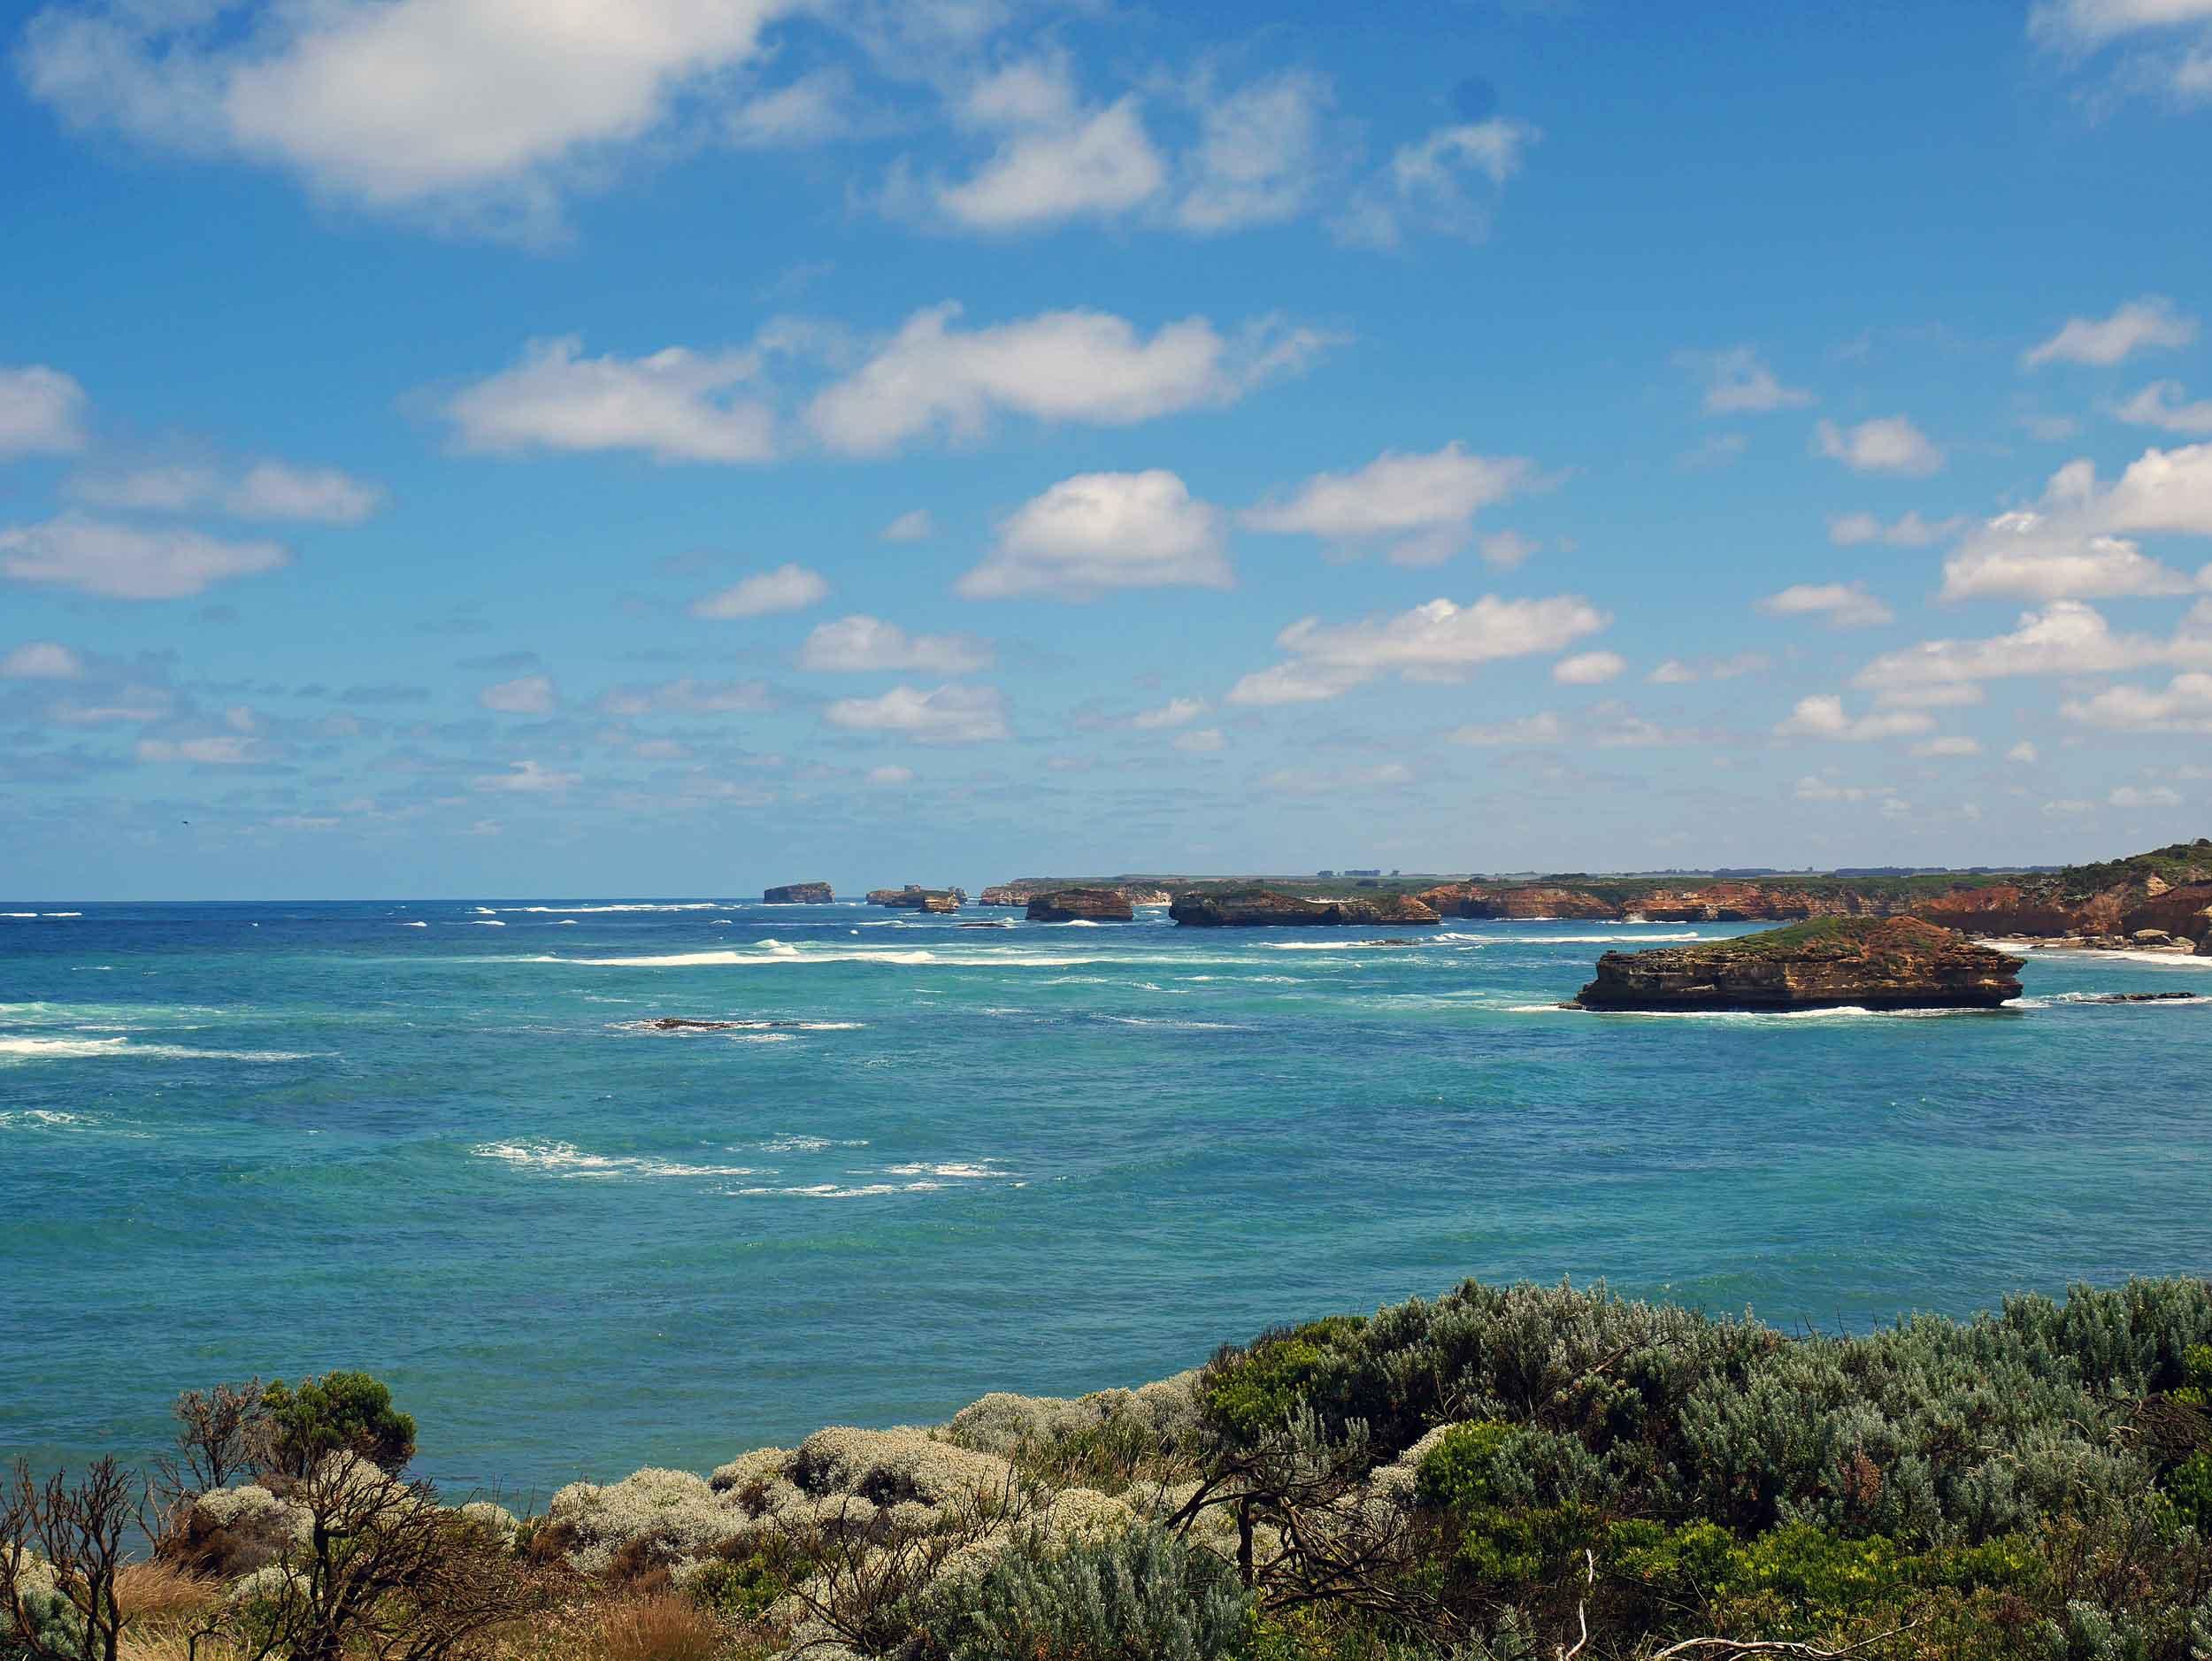 The islands dot the coastline for 23 km (Jan 25).